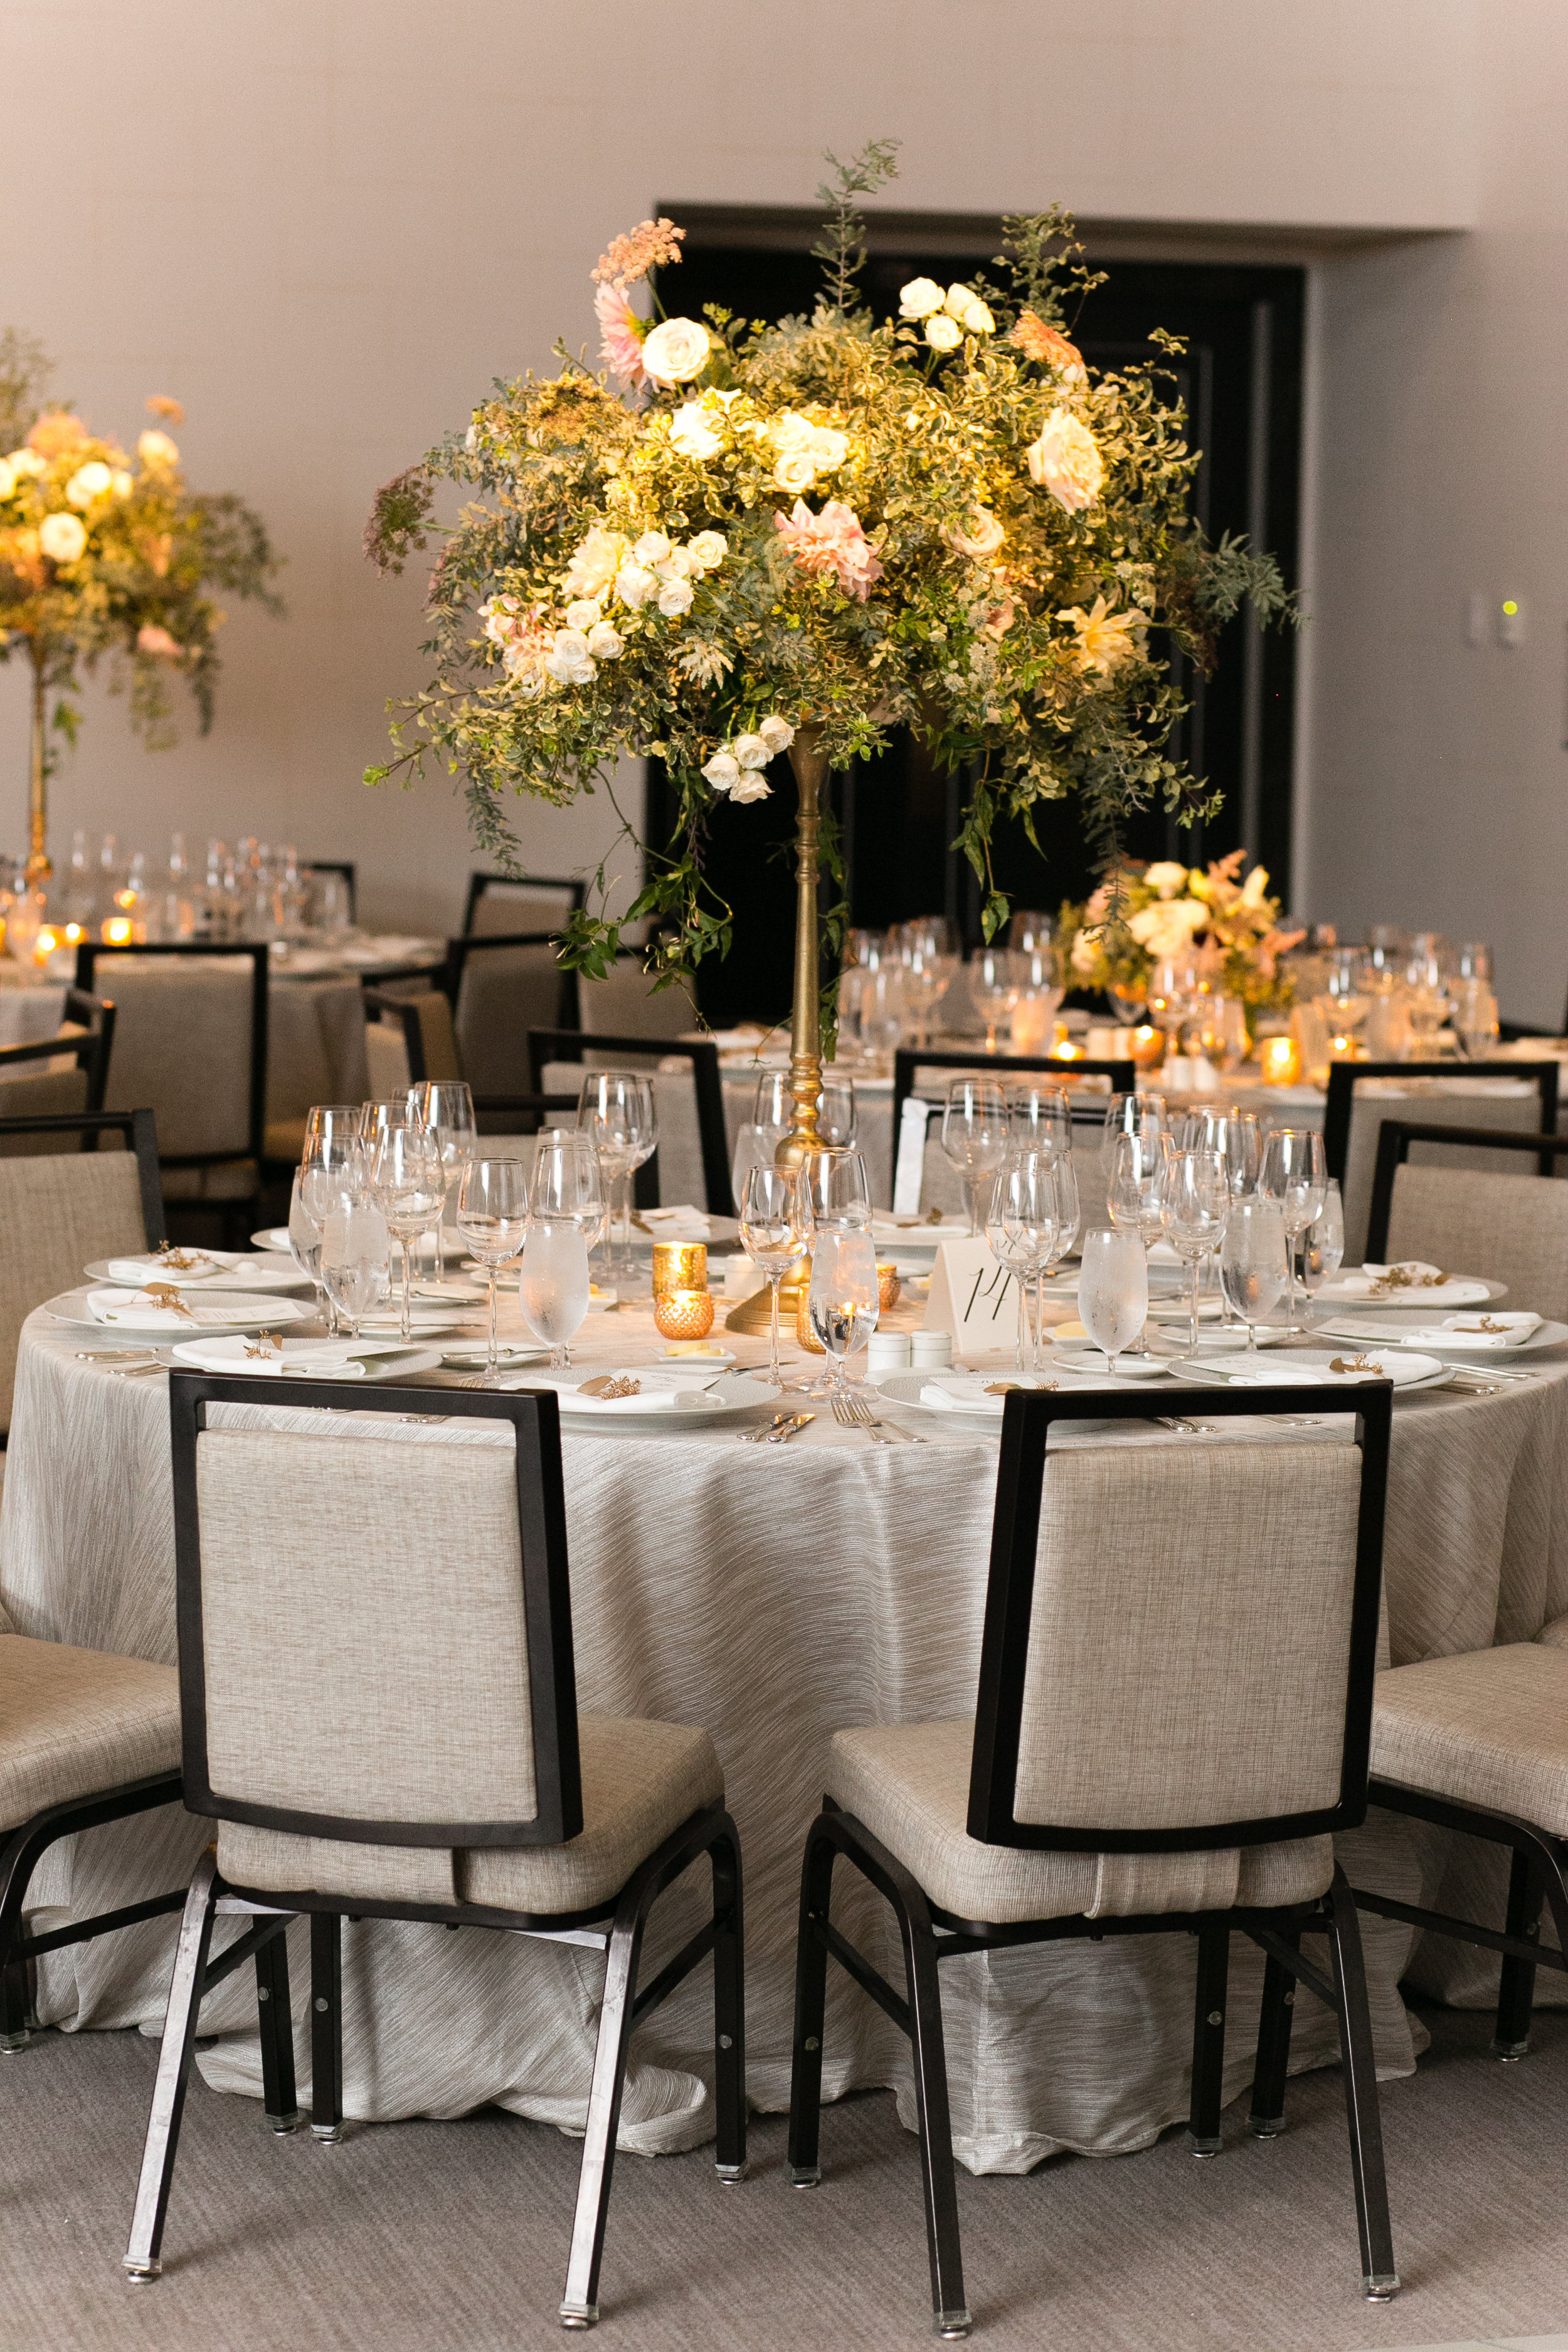 Fleur-Inc-Emilia-Jane-Photography-Estera-Events-Langham-Hotel-Chicago-Wedding-Tall-Centerpiece